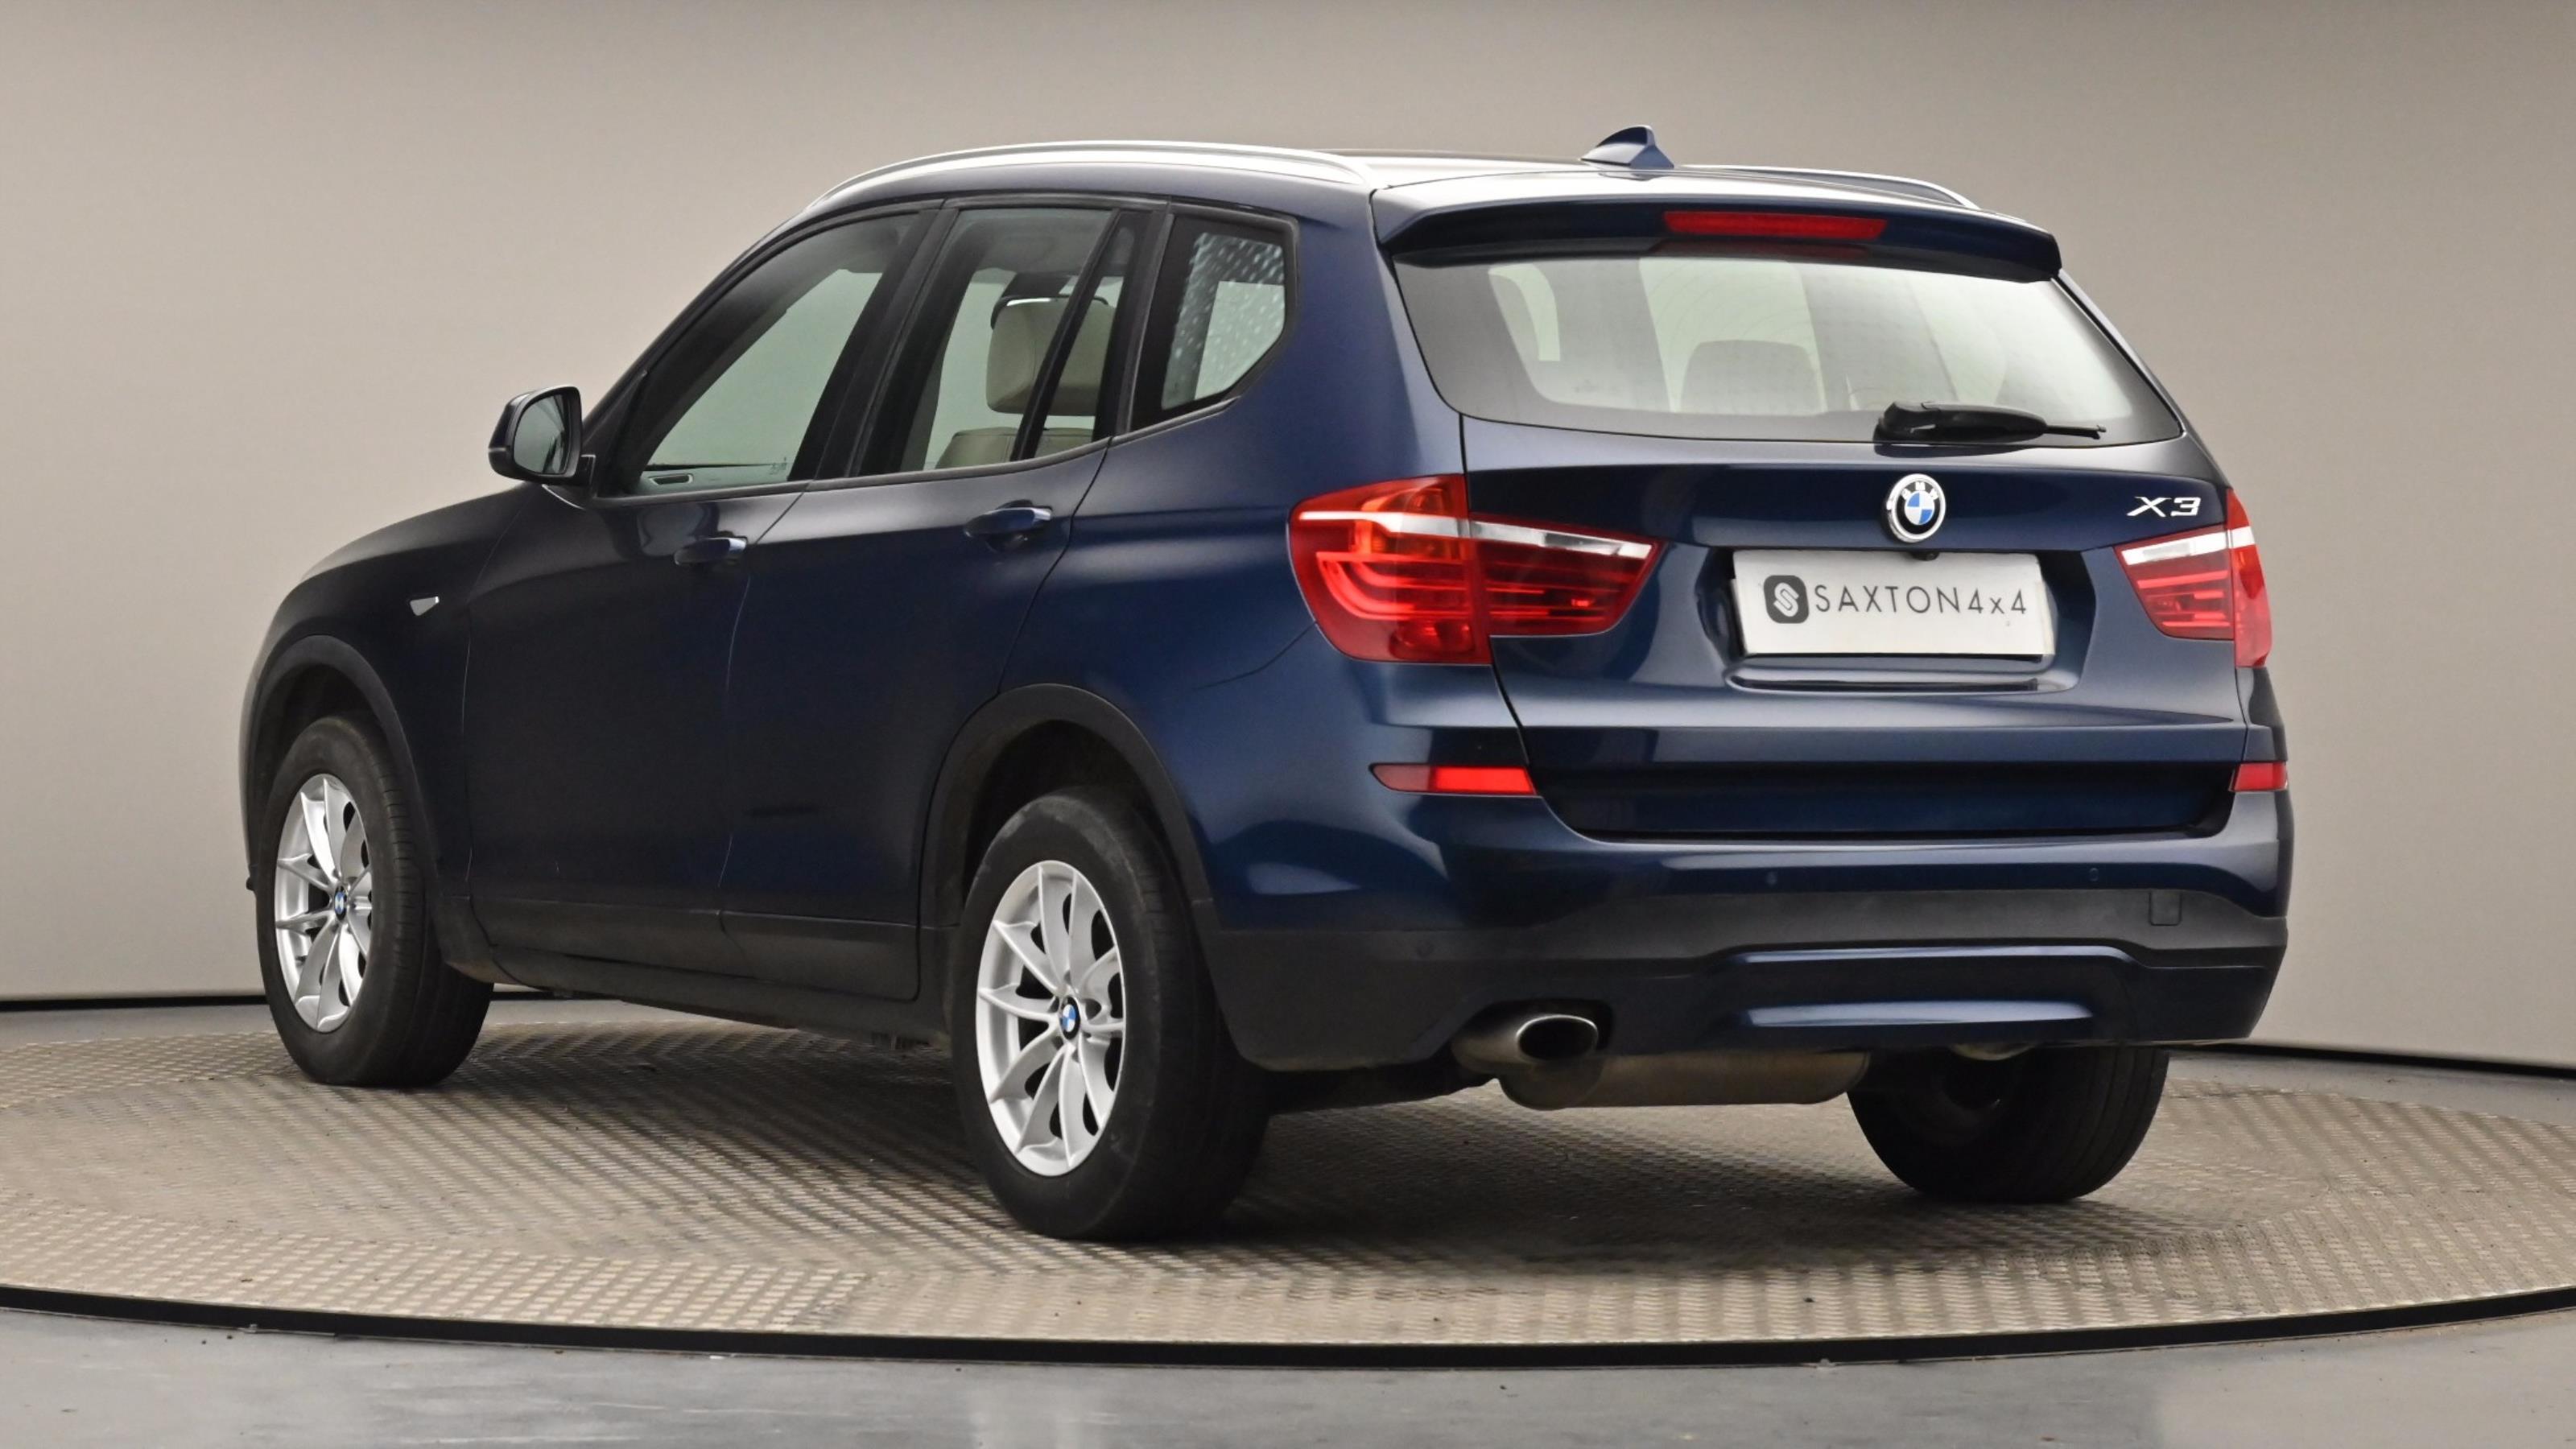 Used 15 BMW X3 xDrive20d SE 5dr Step Auto BLUE at Saxton4x4